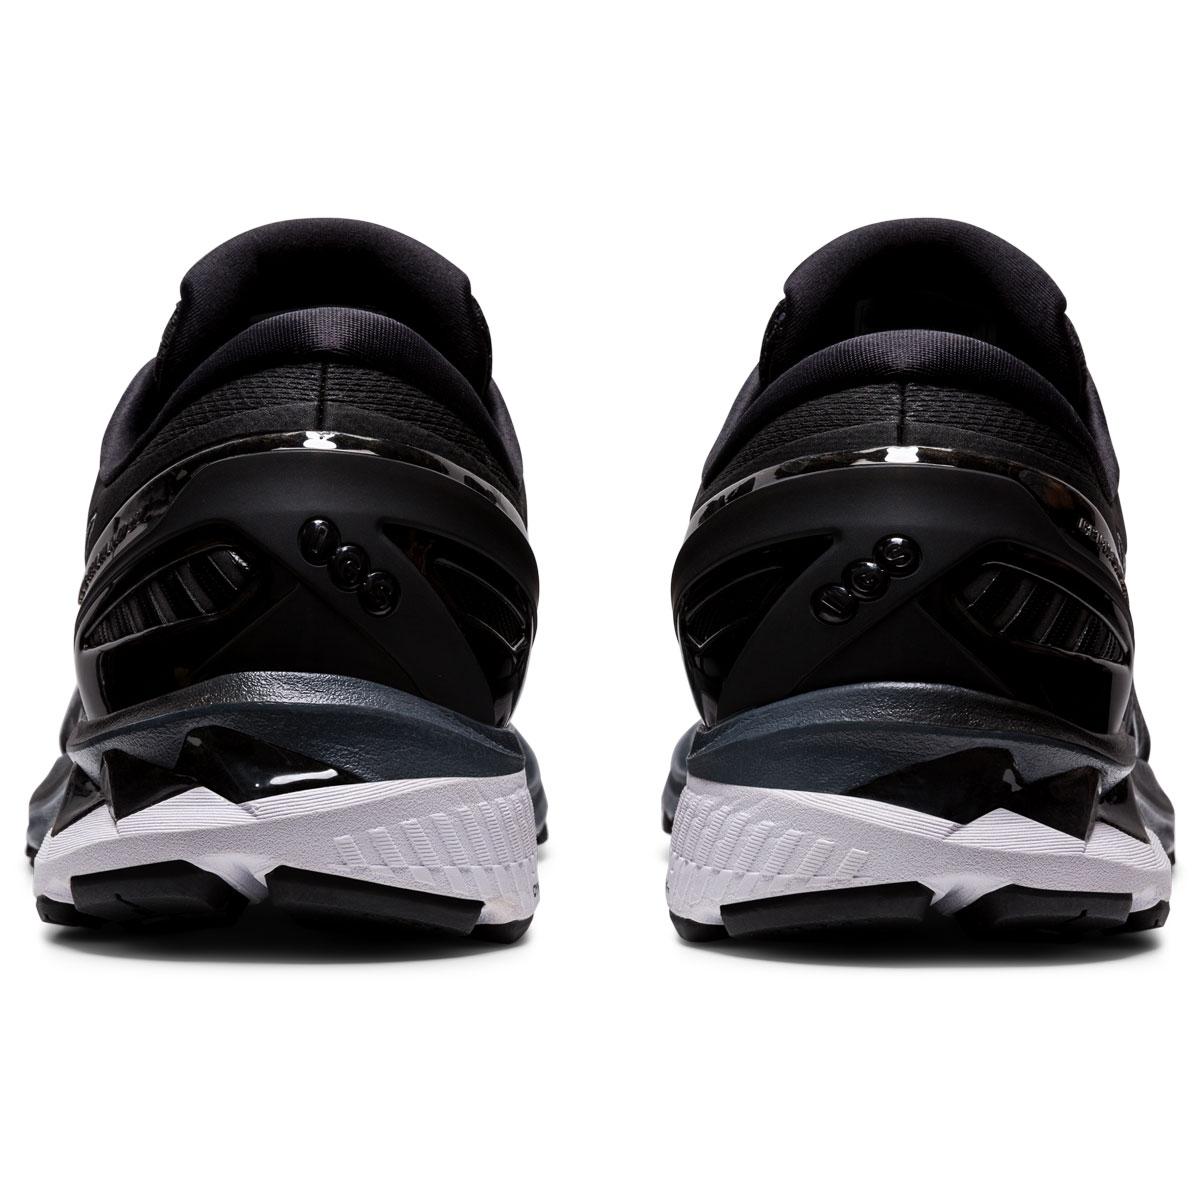 Men's Asics GEL-Kayano 27 Running Shoe - Color: Black/Pure Silv (Regular Width) - Size: 6, Black/Pure Silver, large, image 5